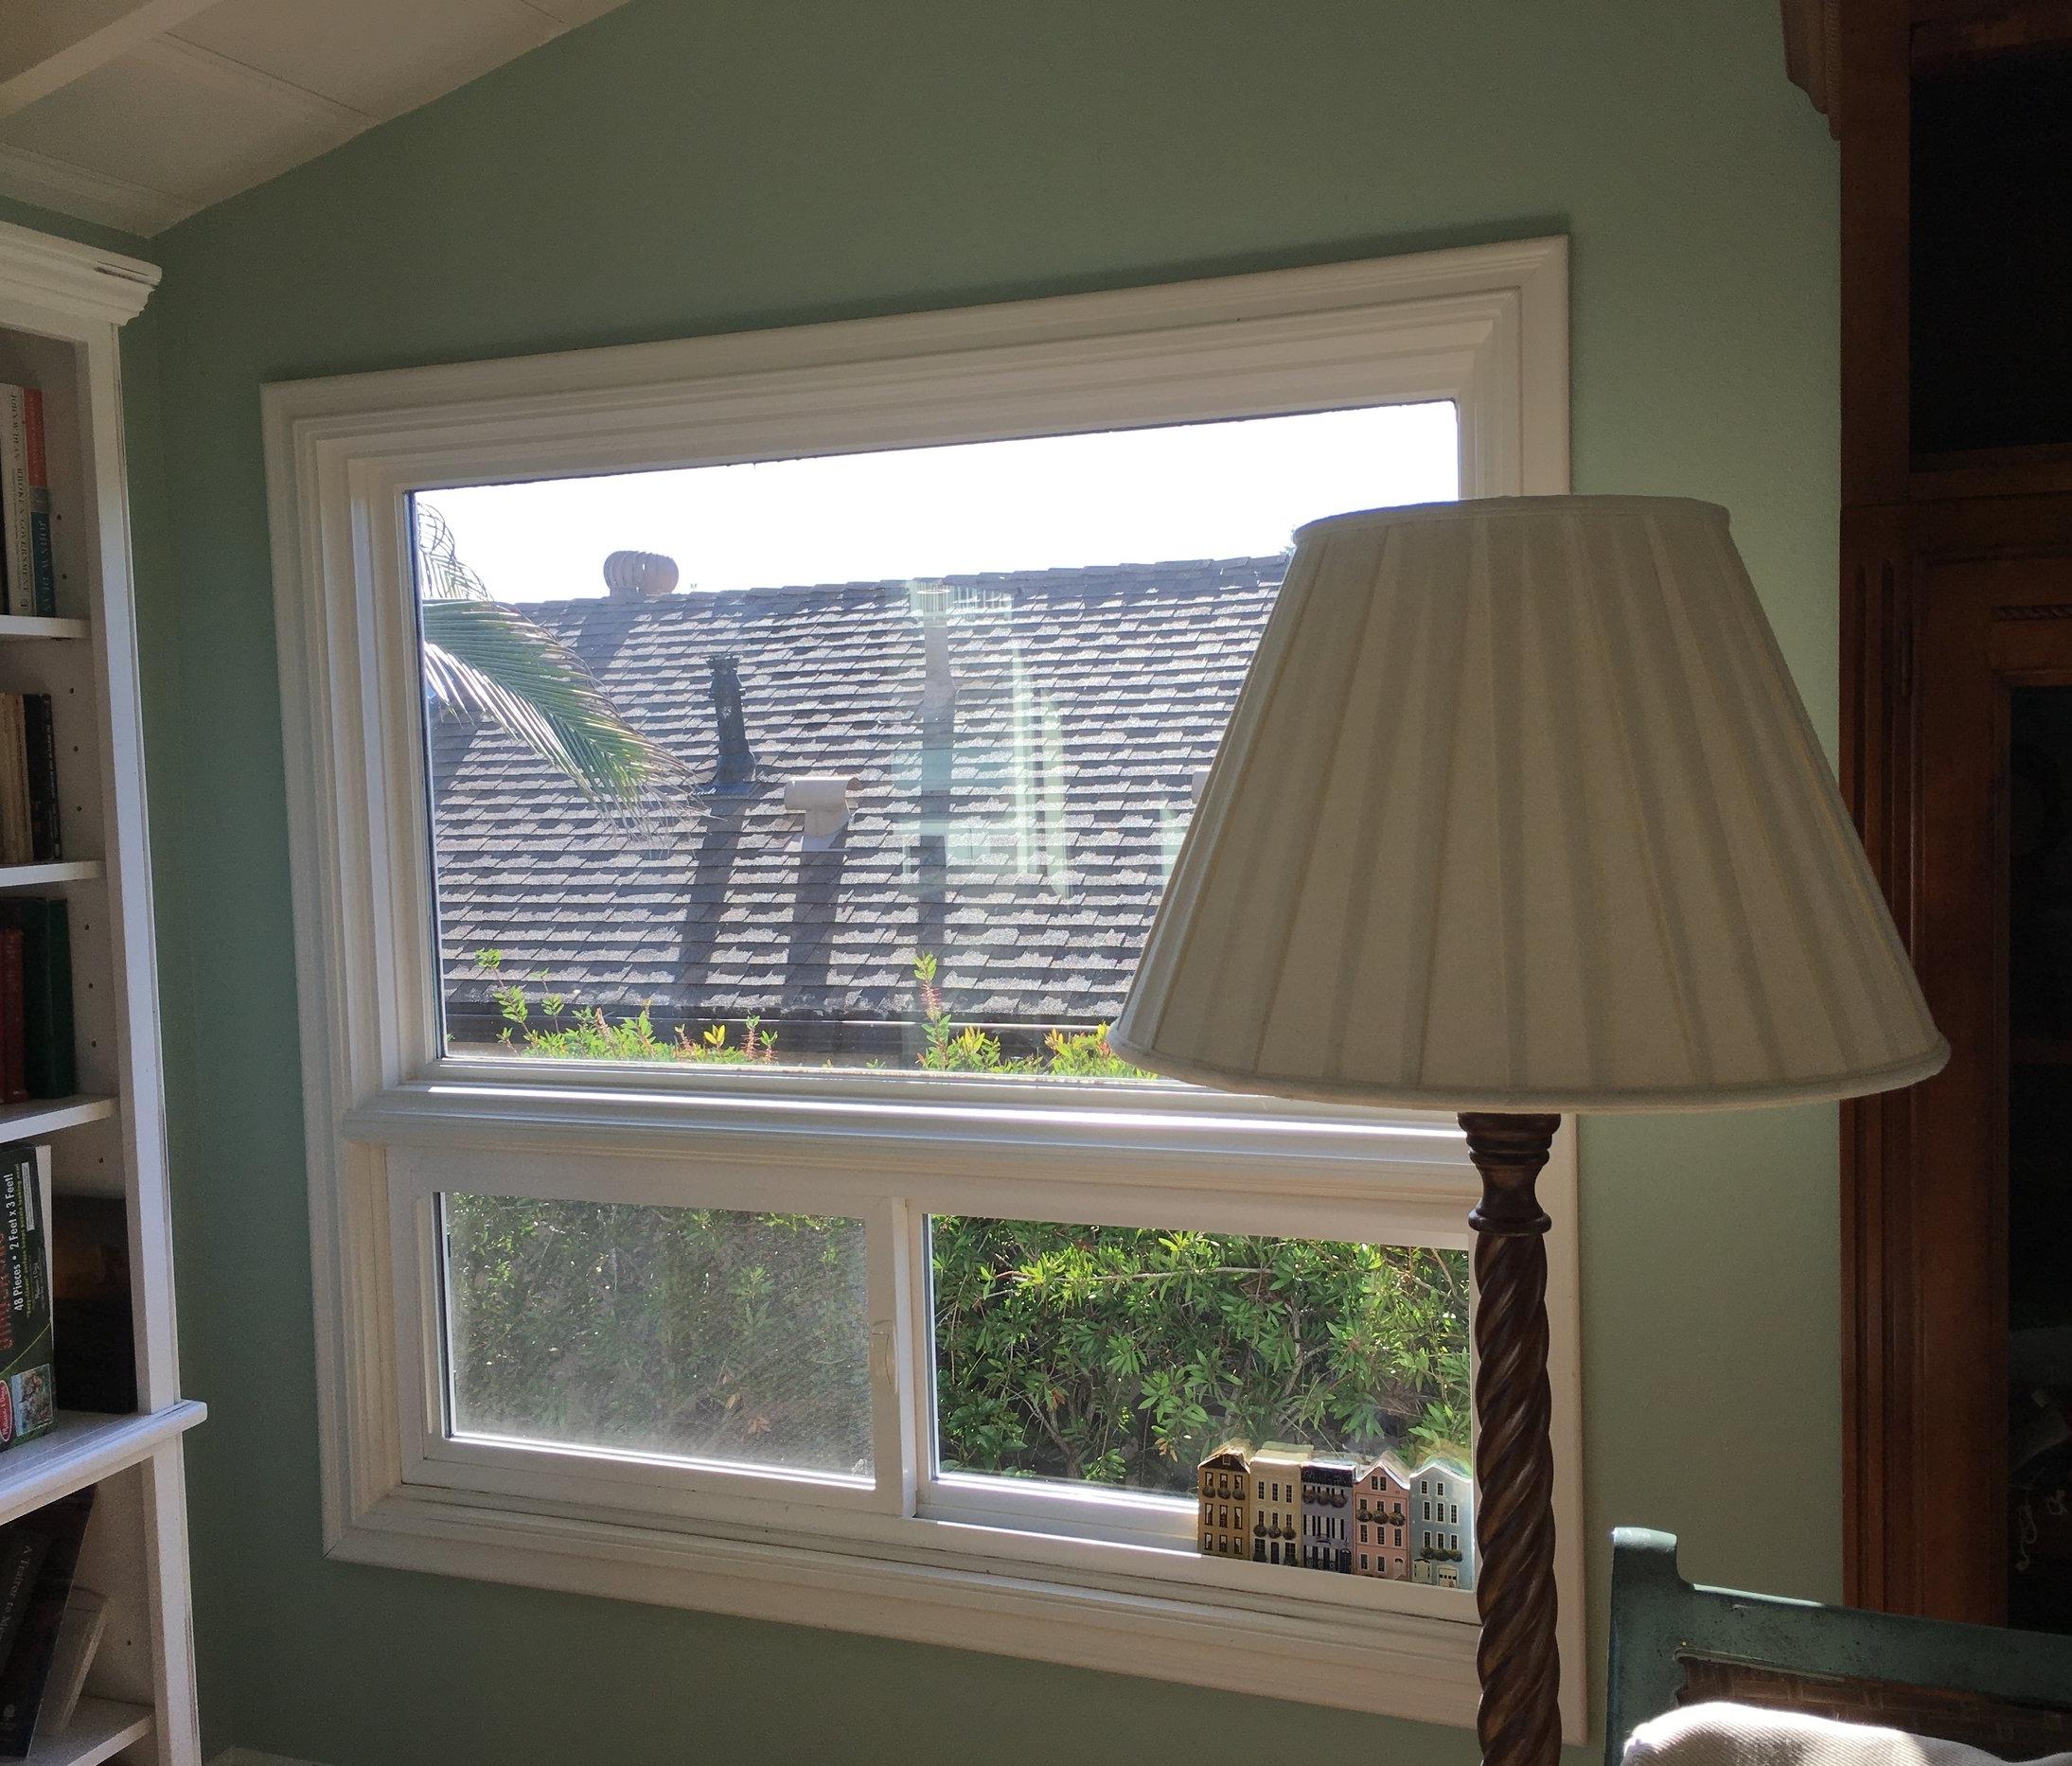 Interior two part window